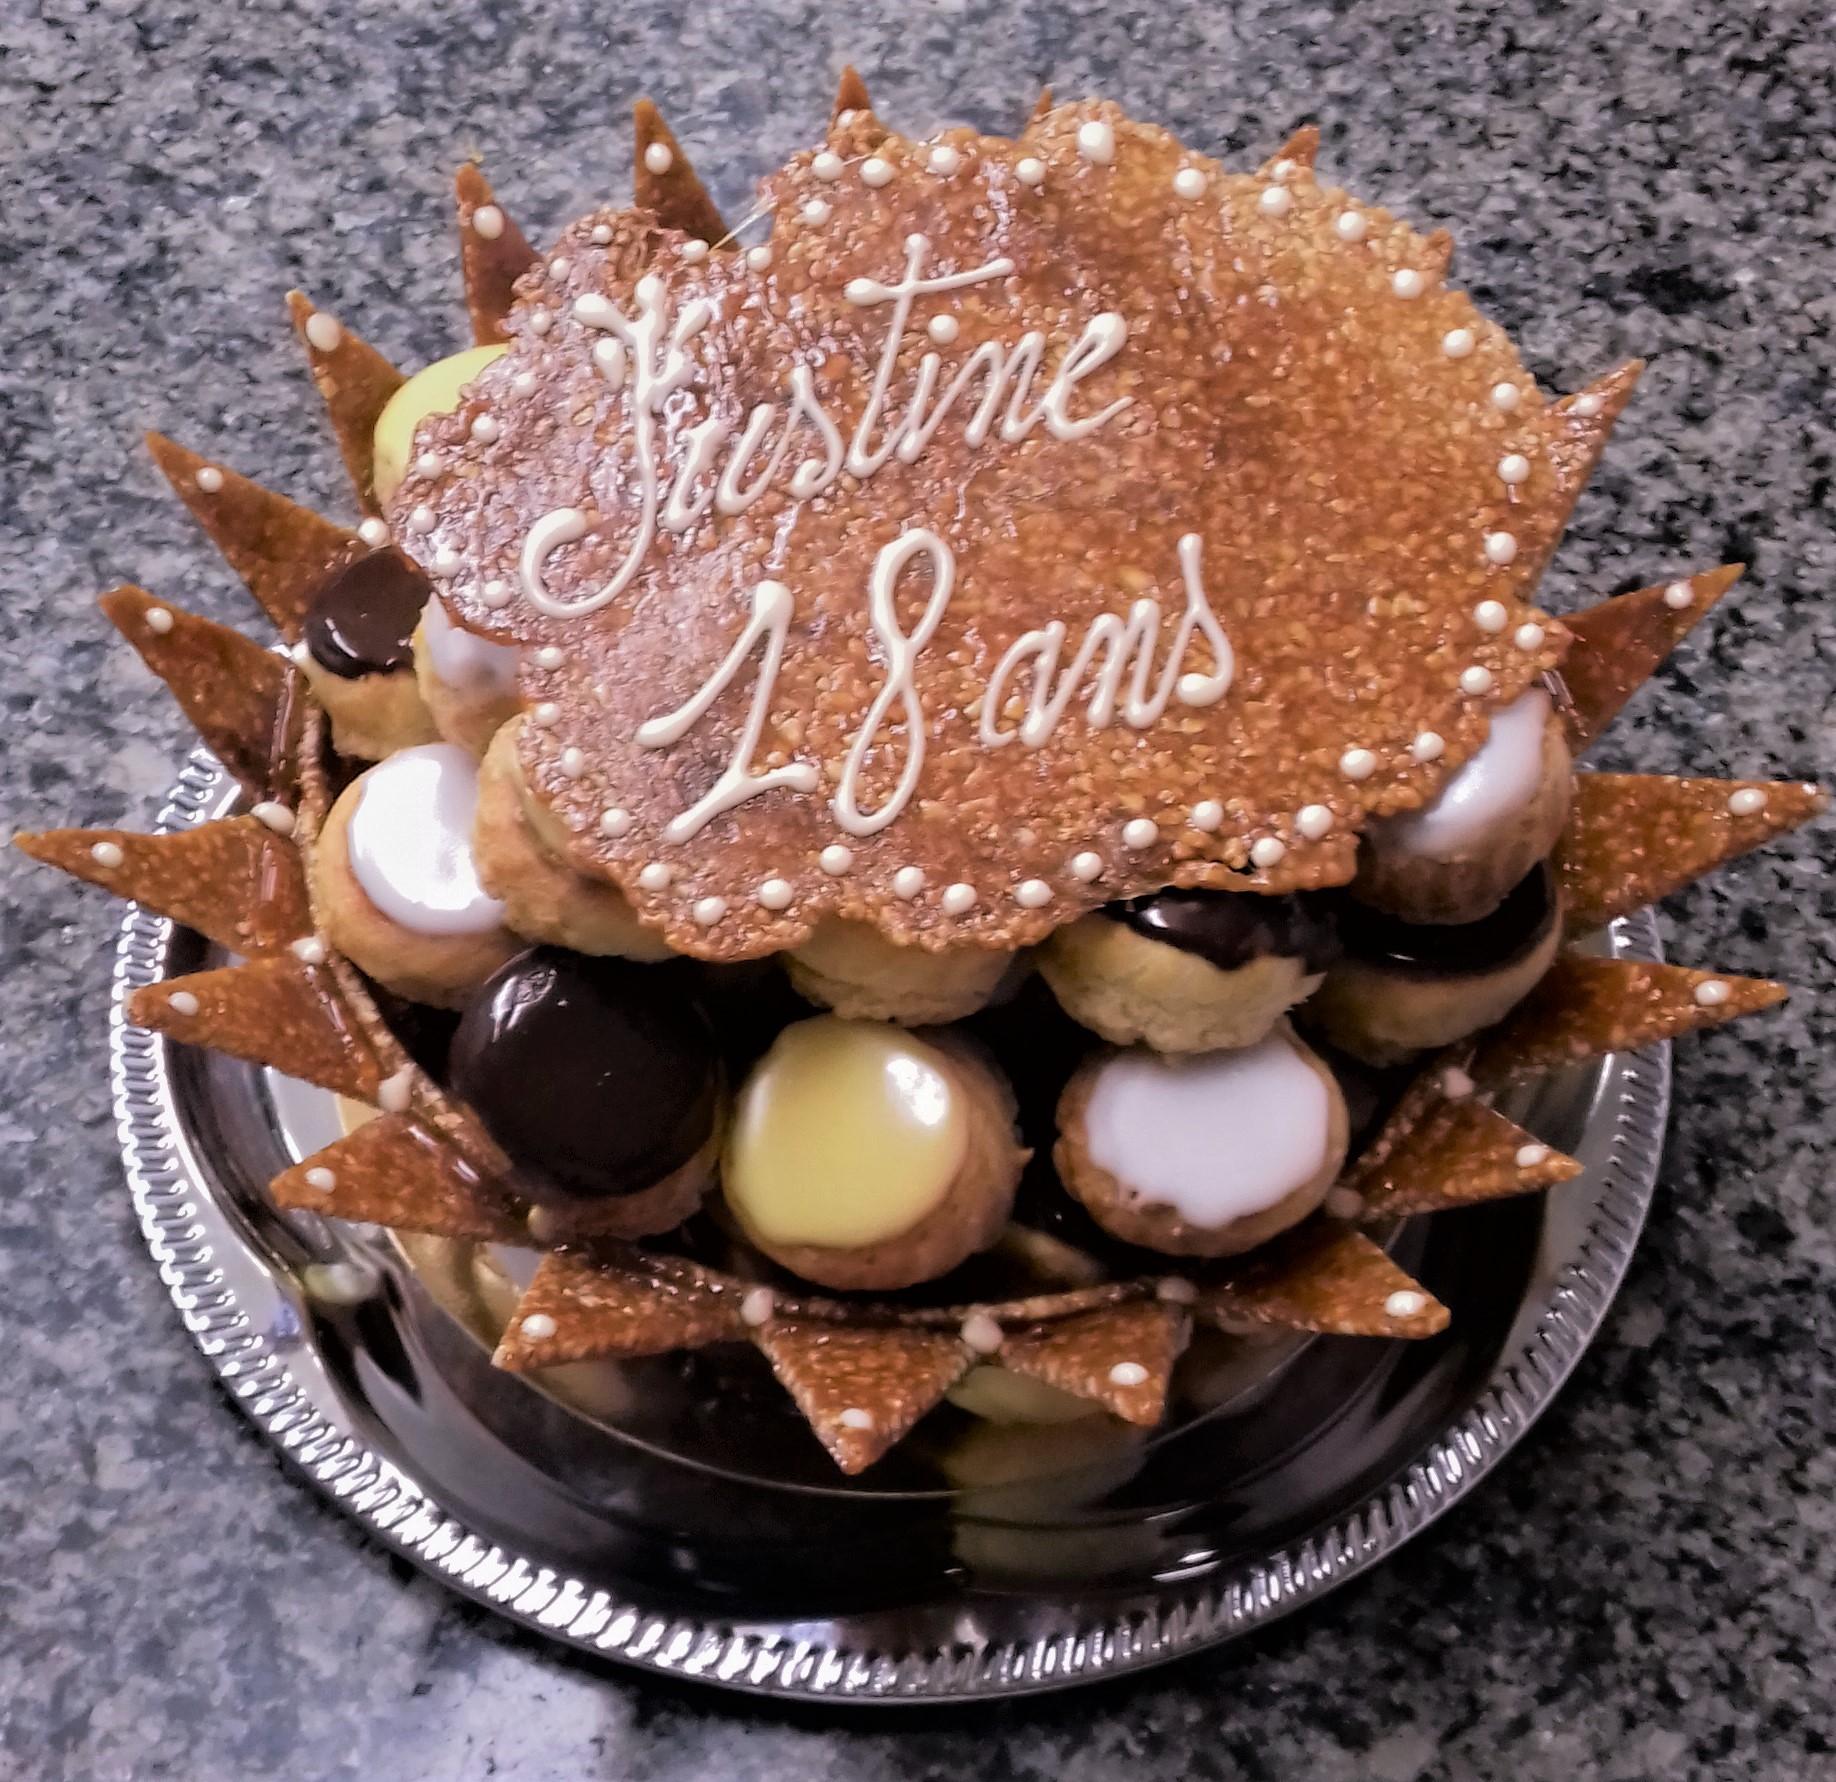 Coupe nougatine avec choux vanille chocolat framboise et mangue passion